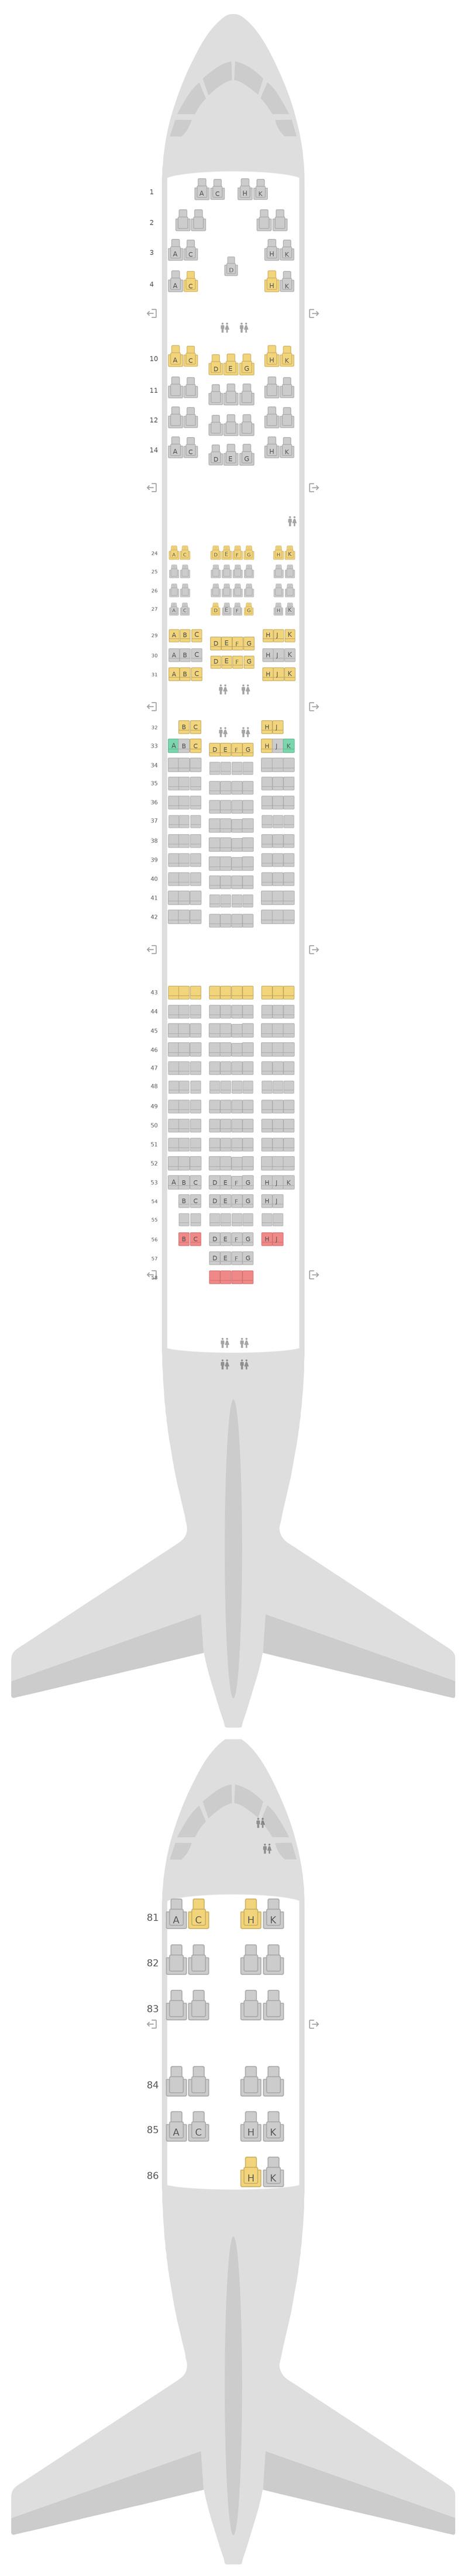 Seat Map Lufthansa Boeing 747-400 (744) v2